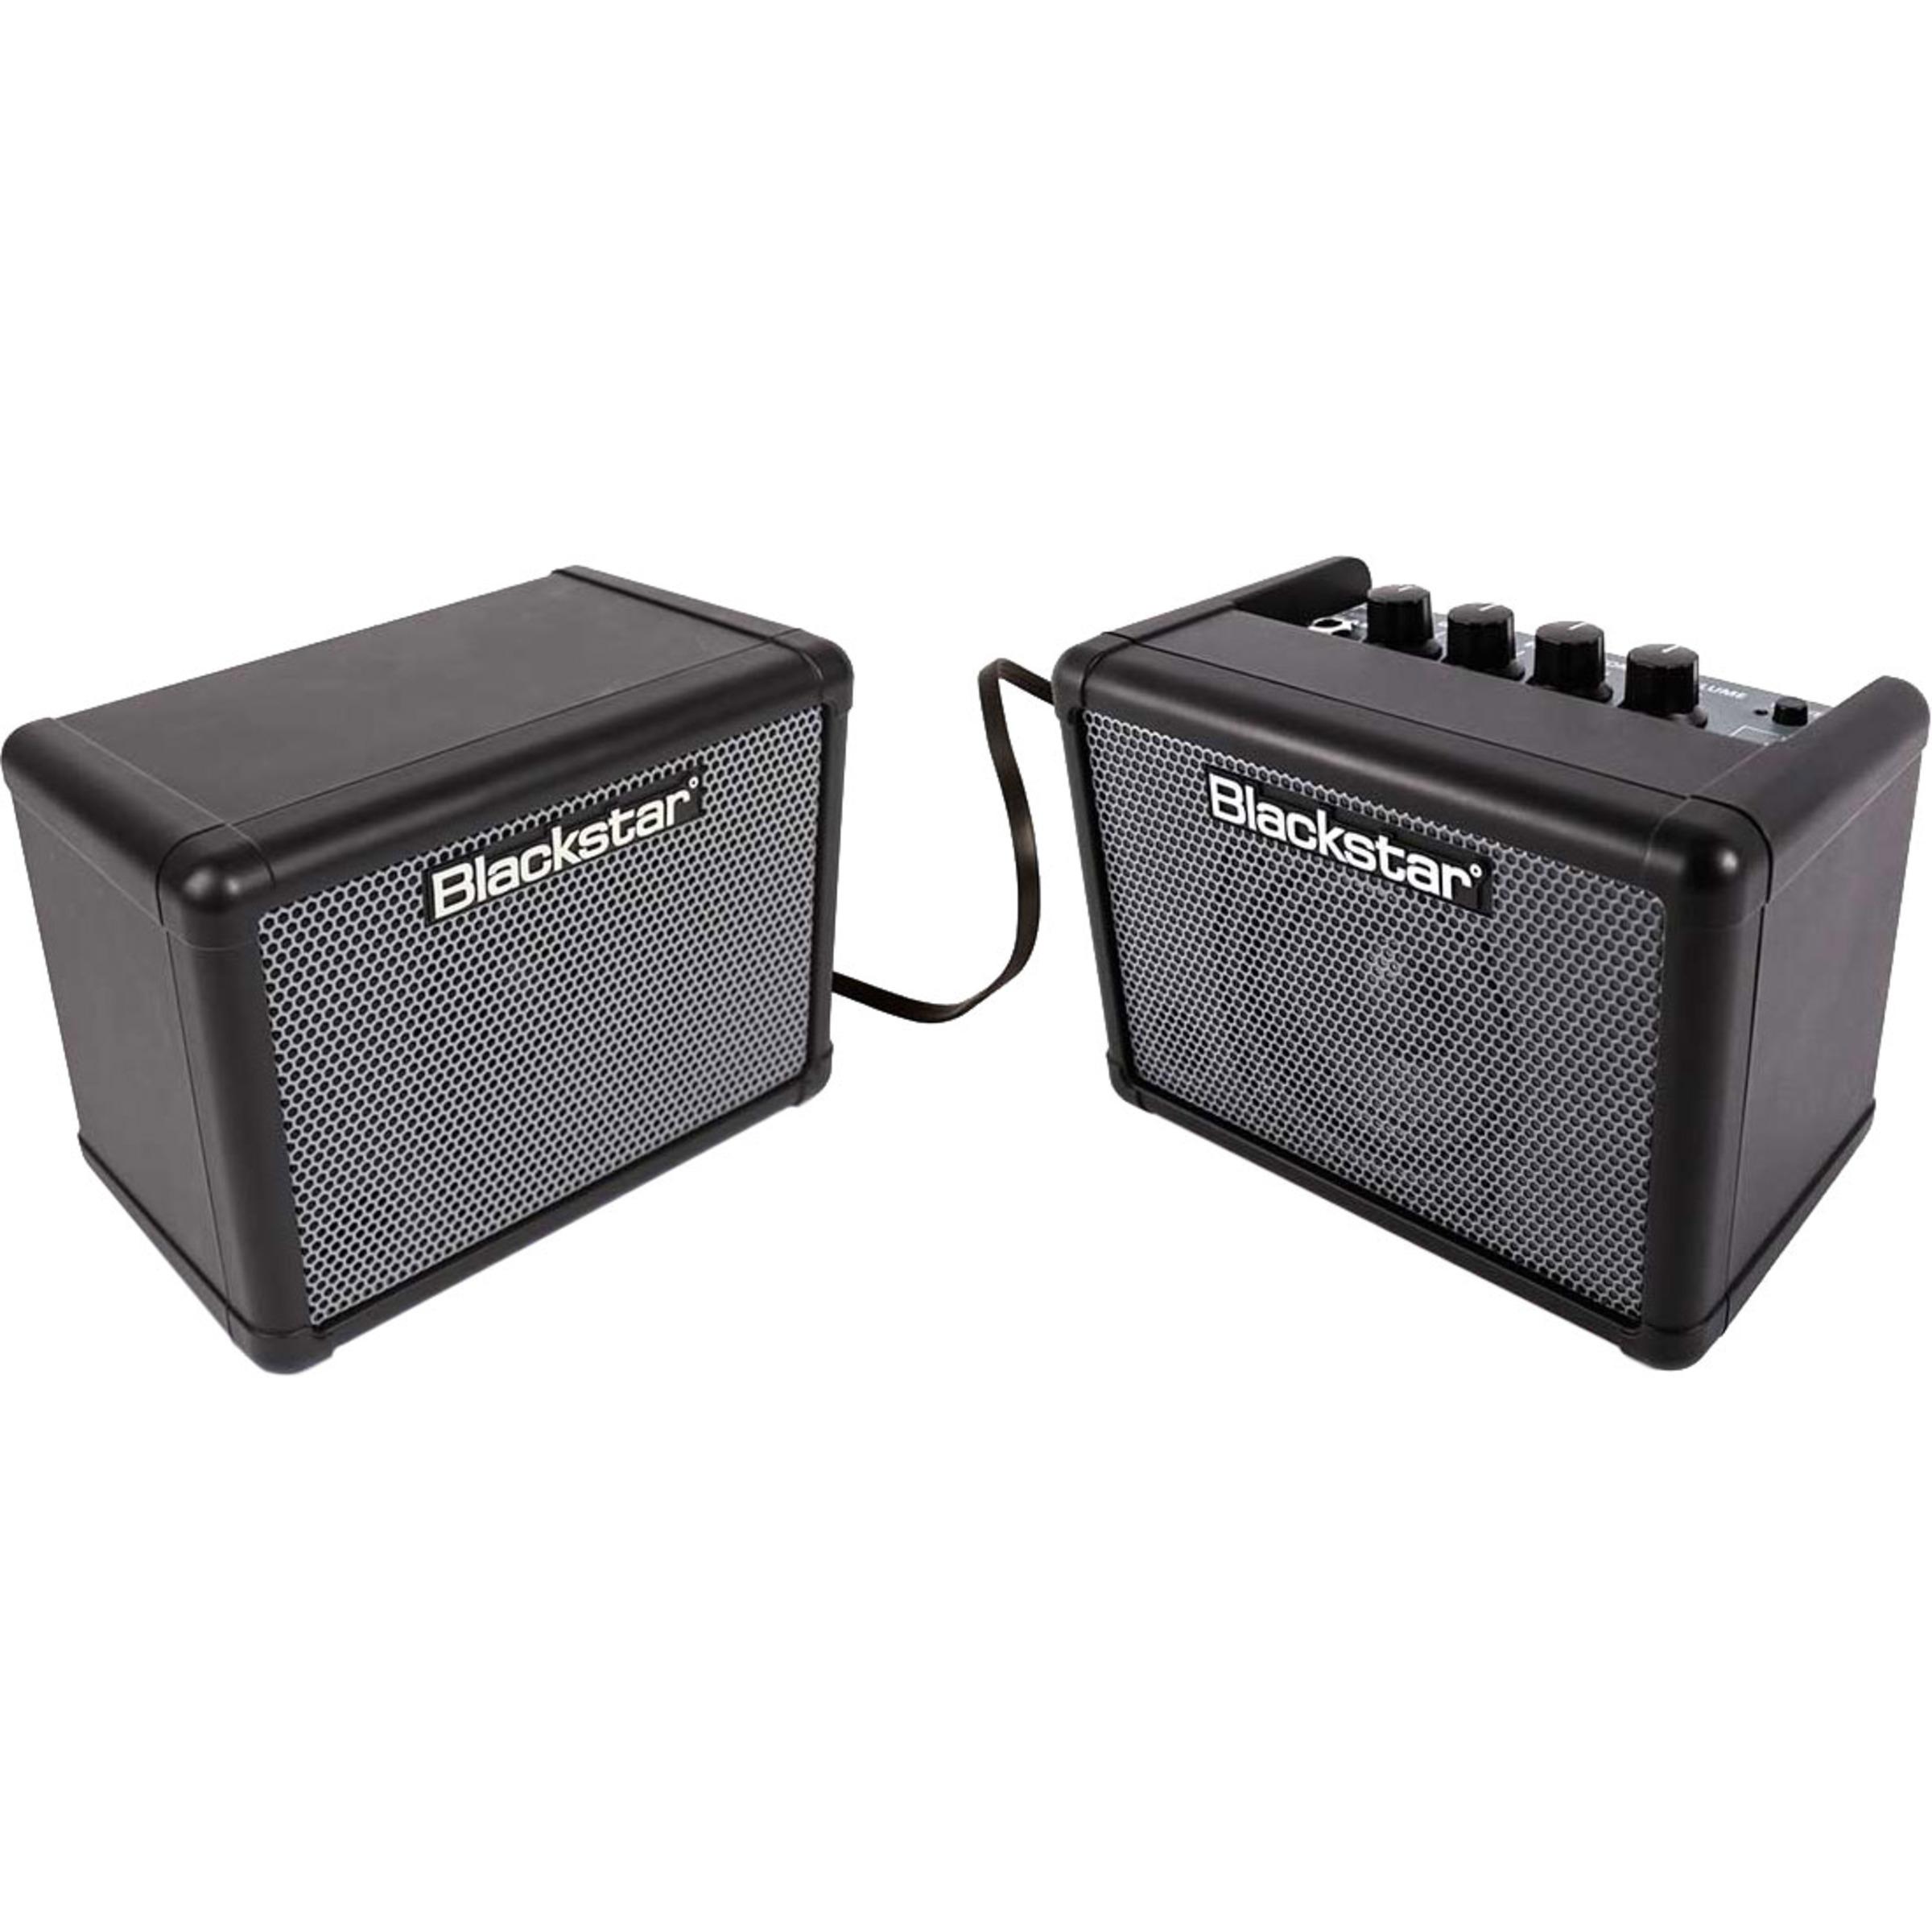 blackstar fly 3 bass stereo package mini bass guitar amplifier giggear. Black Bedroom Furniture Sets. Home Design Ideas